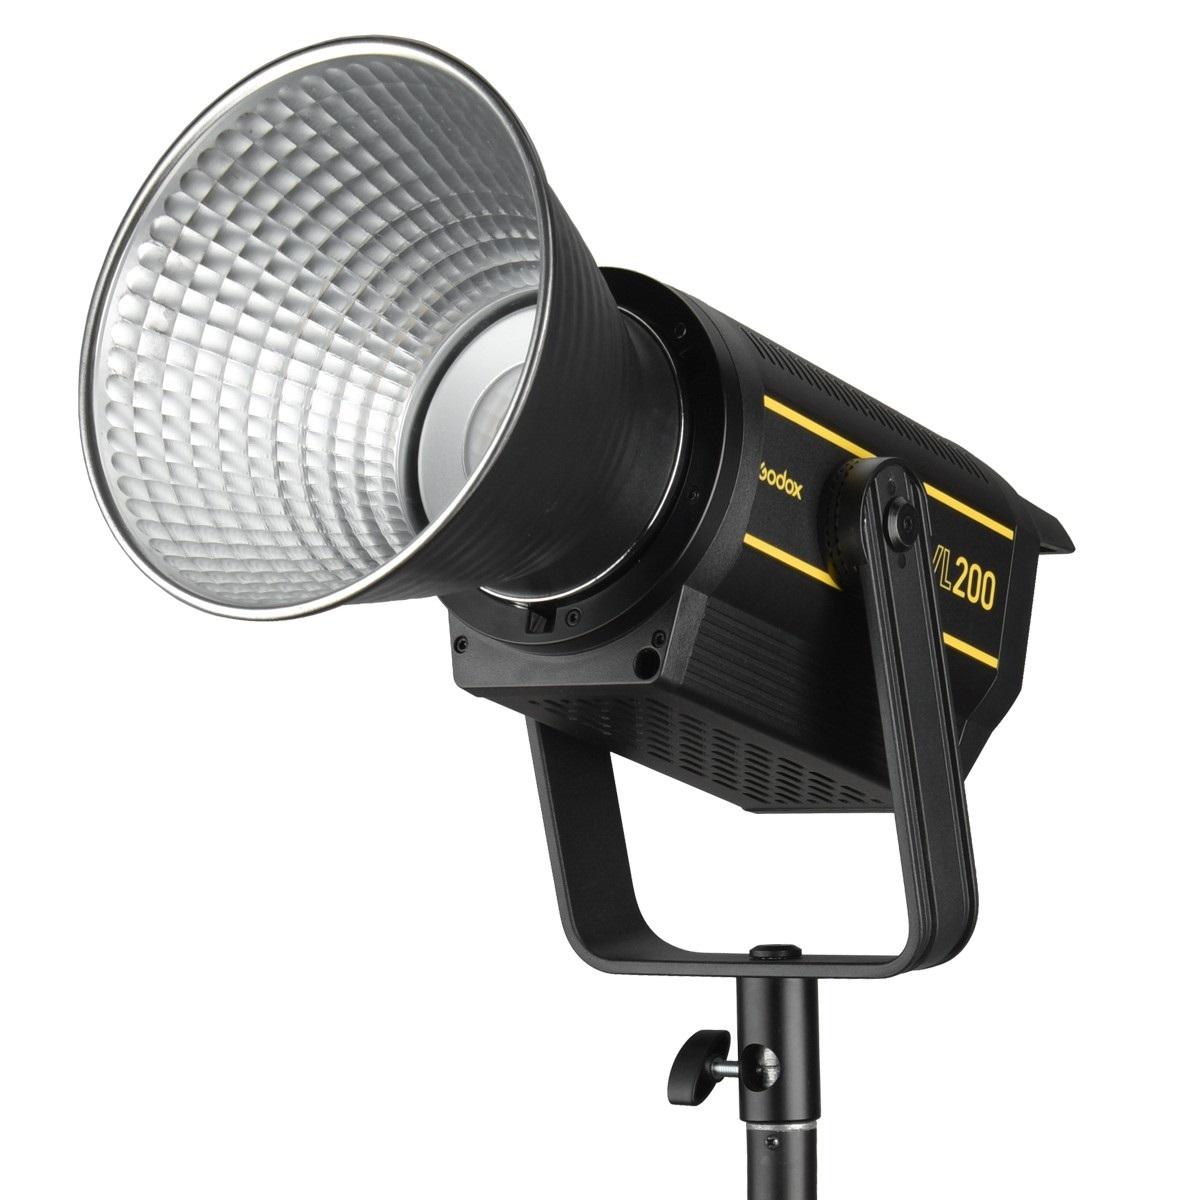 Godox VL200 professionelle LED Leuchte Serie VL